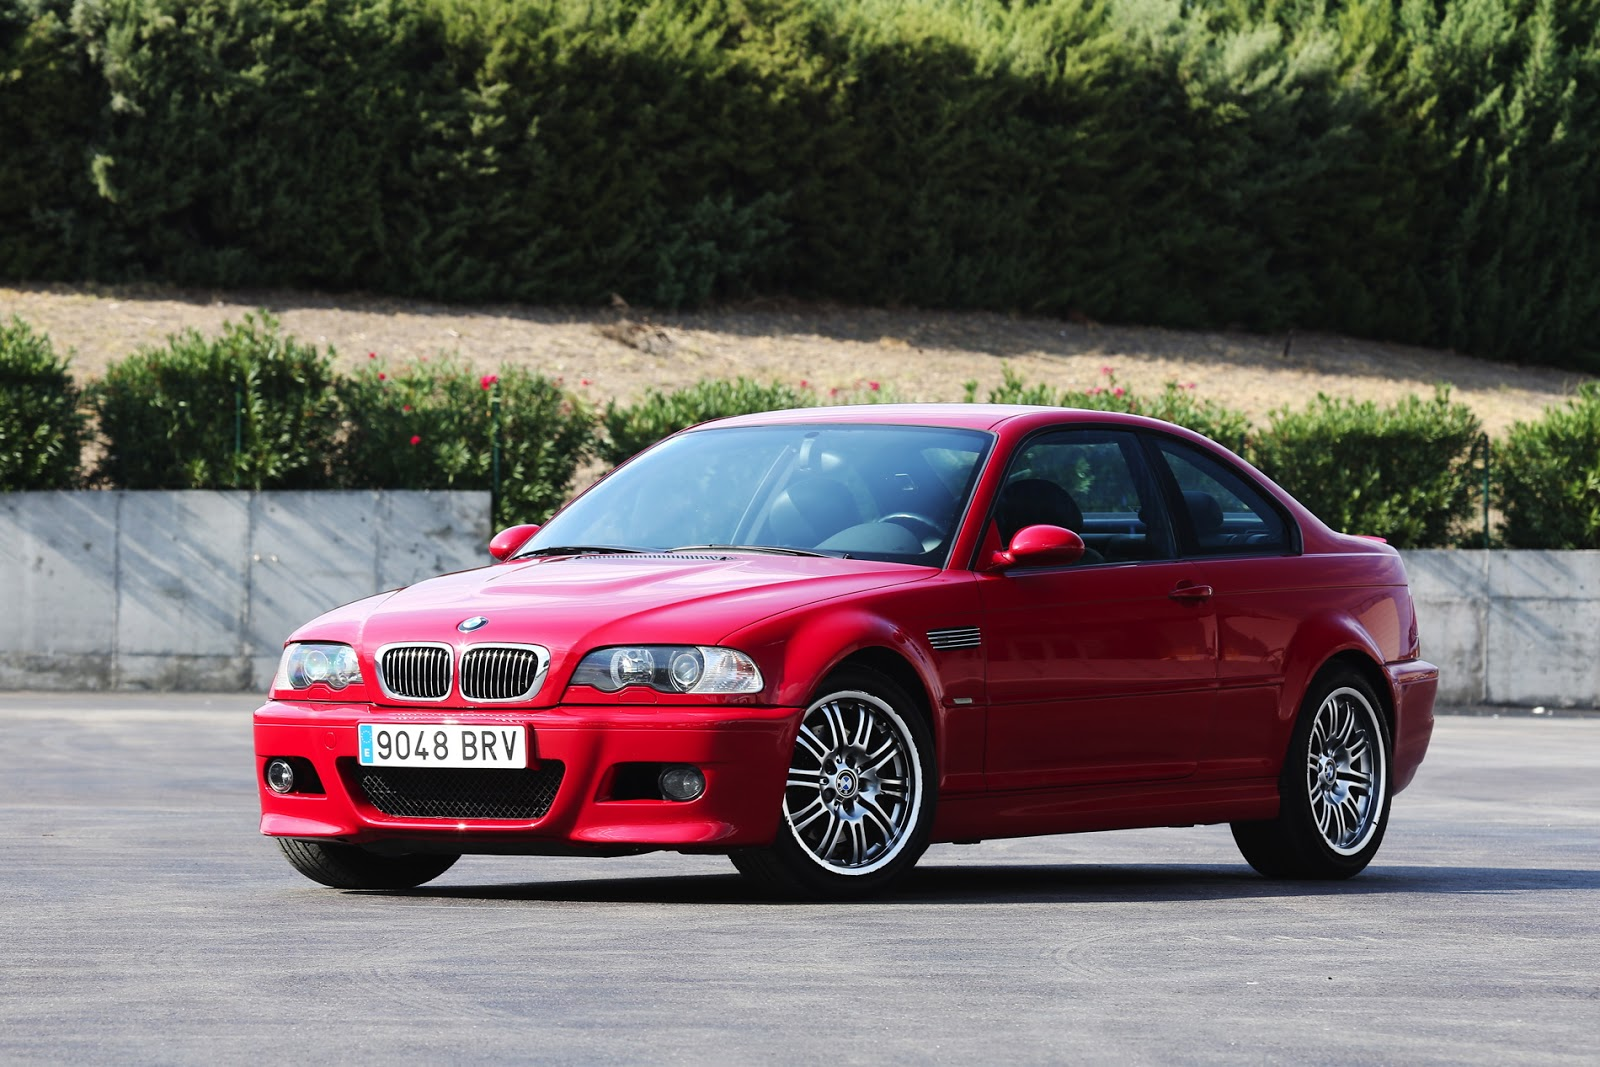 "BMW M3 E46 15 ""φθηνά"" μεταχειρισμένα που στρίβουν σαν τρένα Audi S3, BMW M3 E46, Ford Focus RS, Lancia Delta Integralle, Lotus Elise, Mazda RX8, Mitsubishi Evo, Nissan Sunny GTI-R, Peugeot 106 Rallye, Porsche Boxster, Subaru Impreza WRX, zblog, αυτοκίνητα"